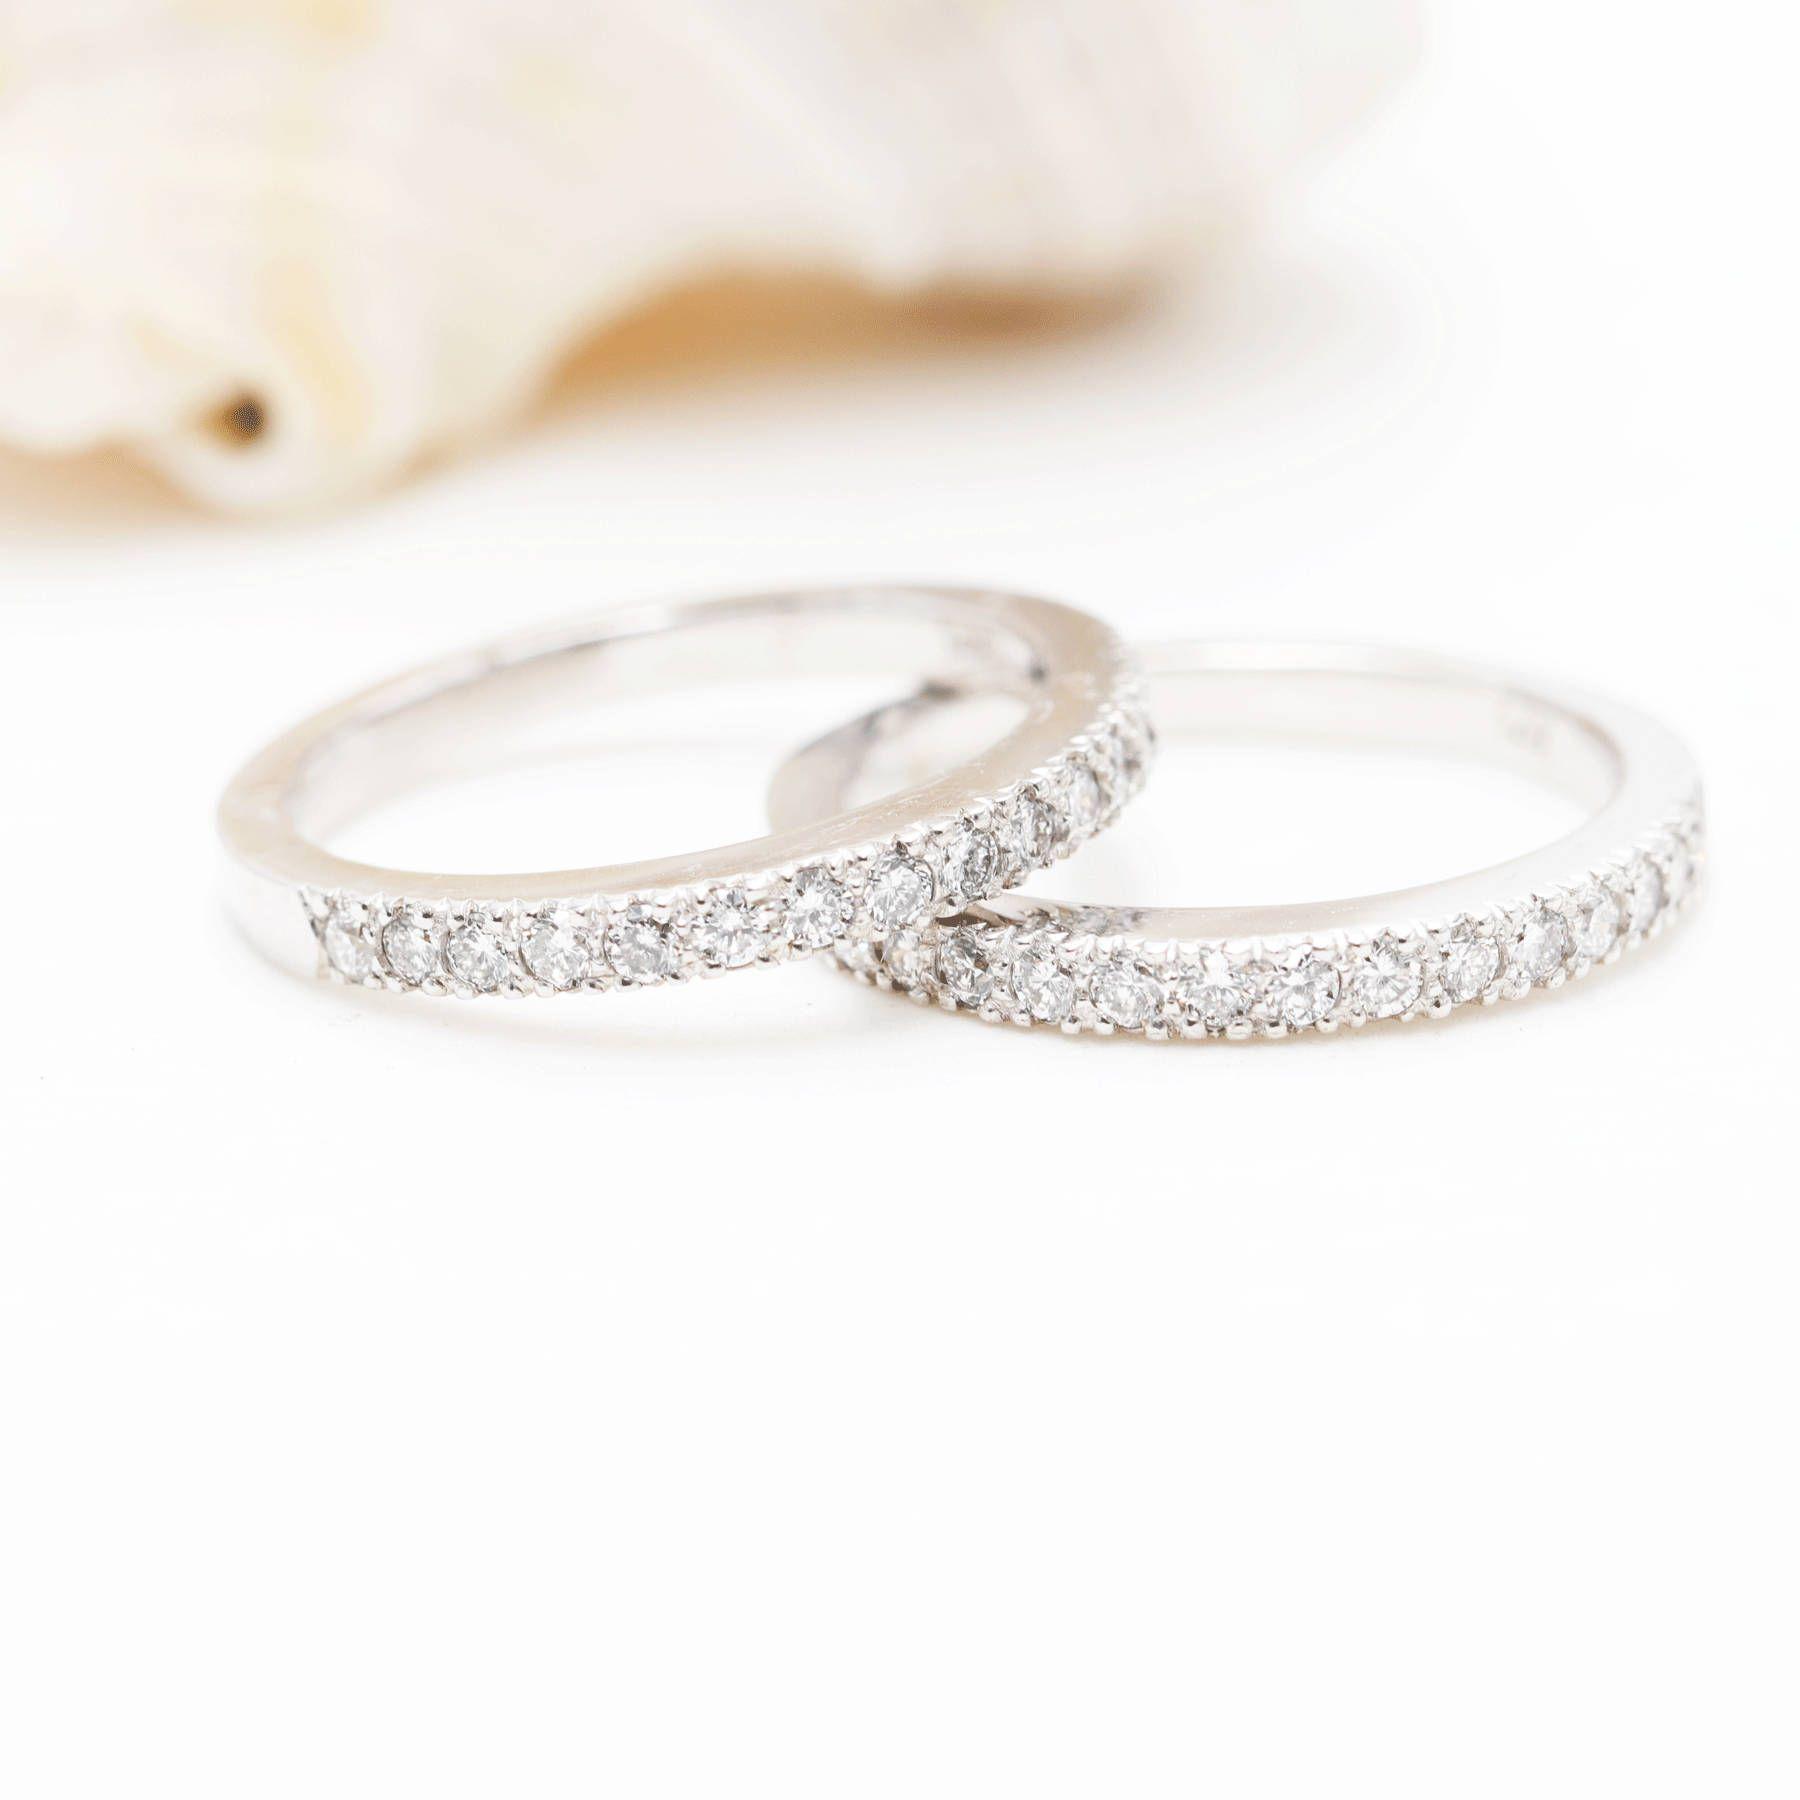 High Quality Diamond Double Row Wedding Band 0 73ct Natural Etsy In 2020 Diamond Wedding Bands Quality Diamonds Wedding Bands